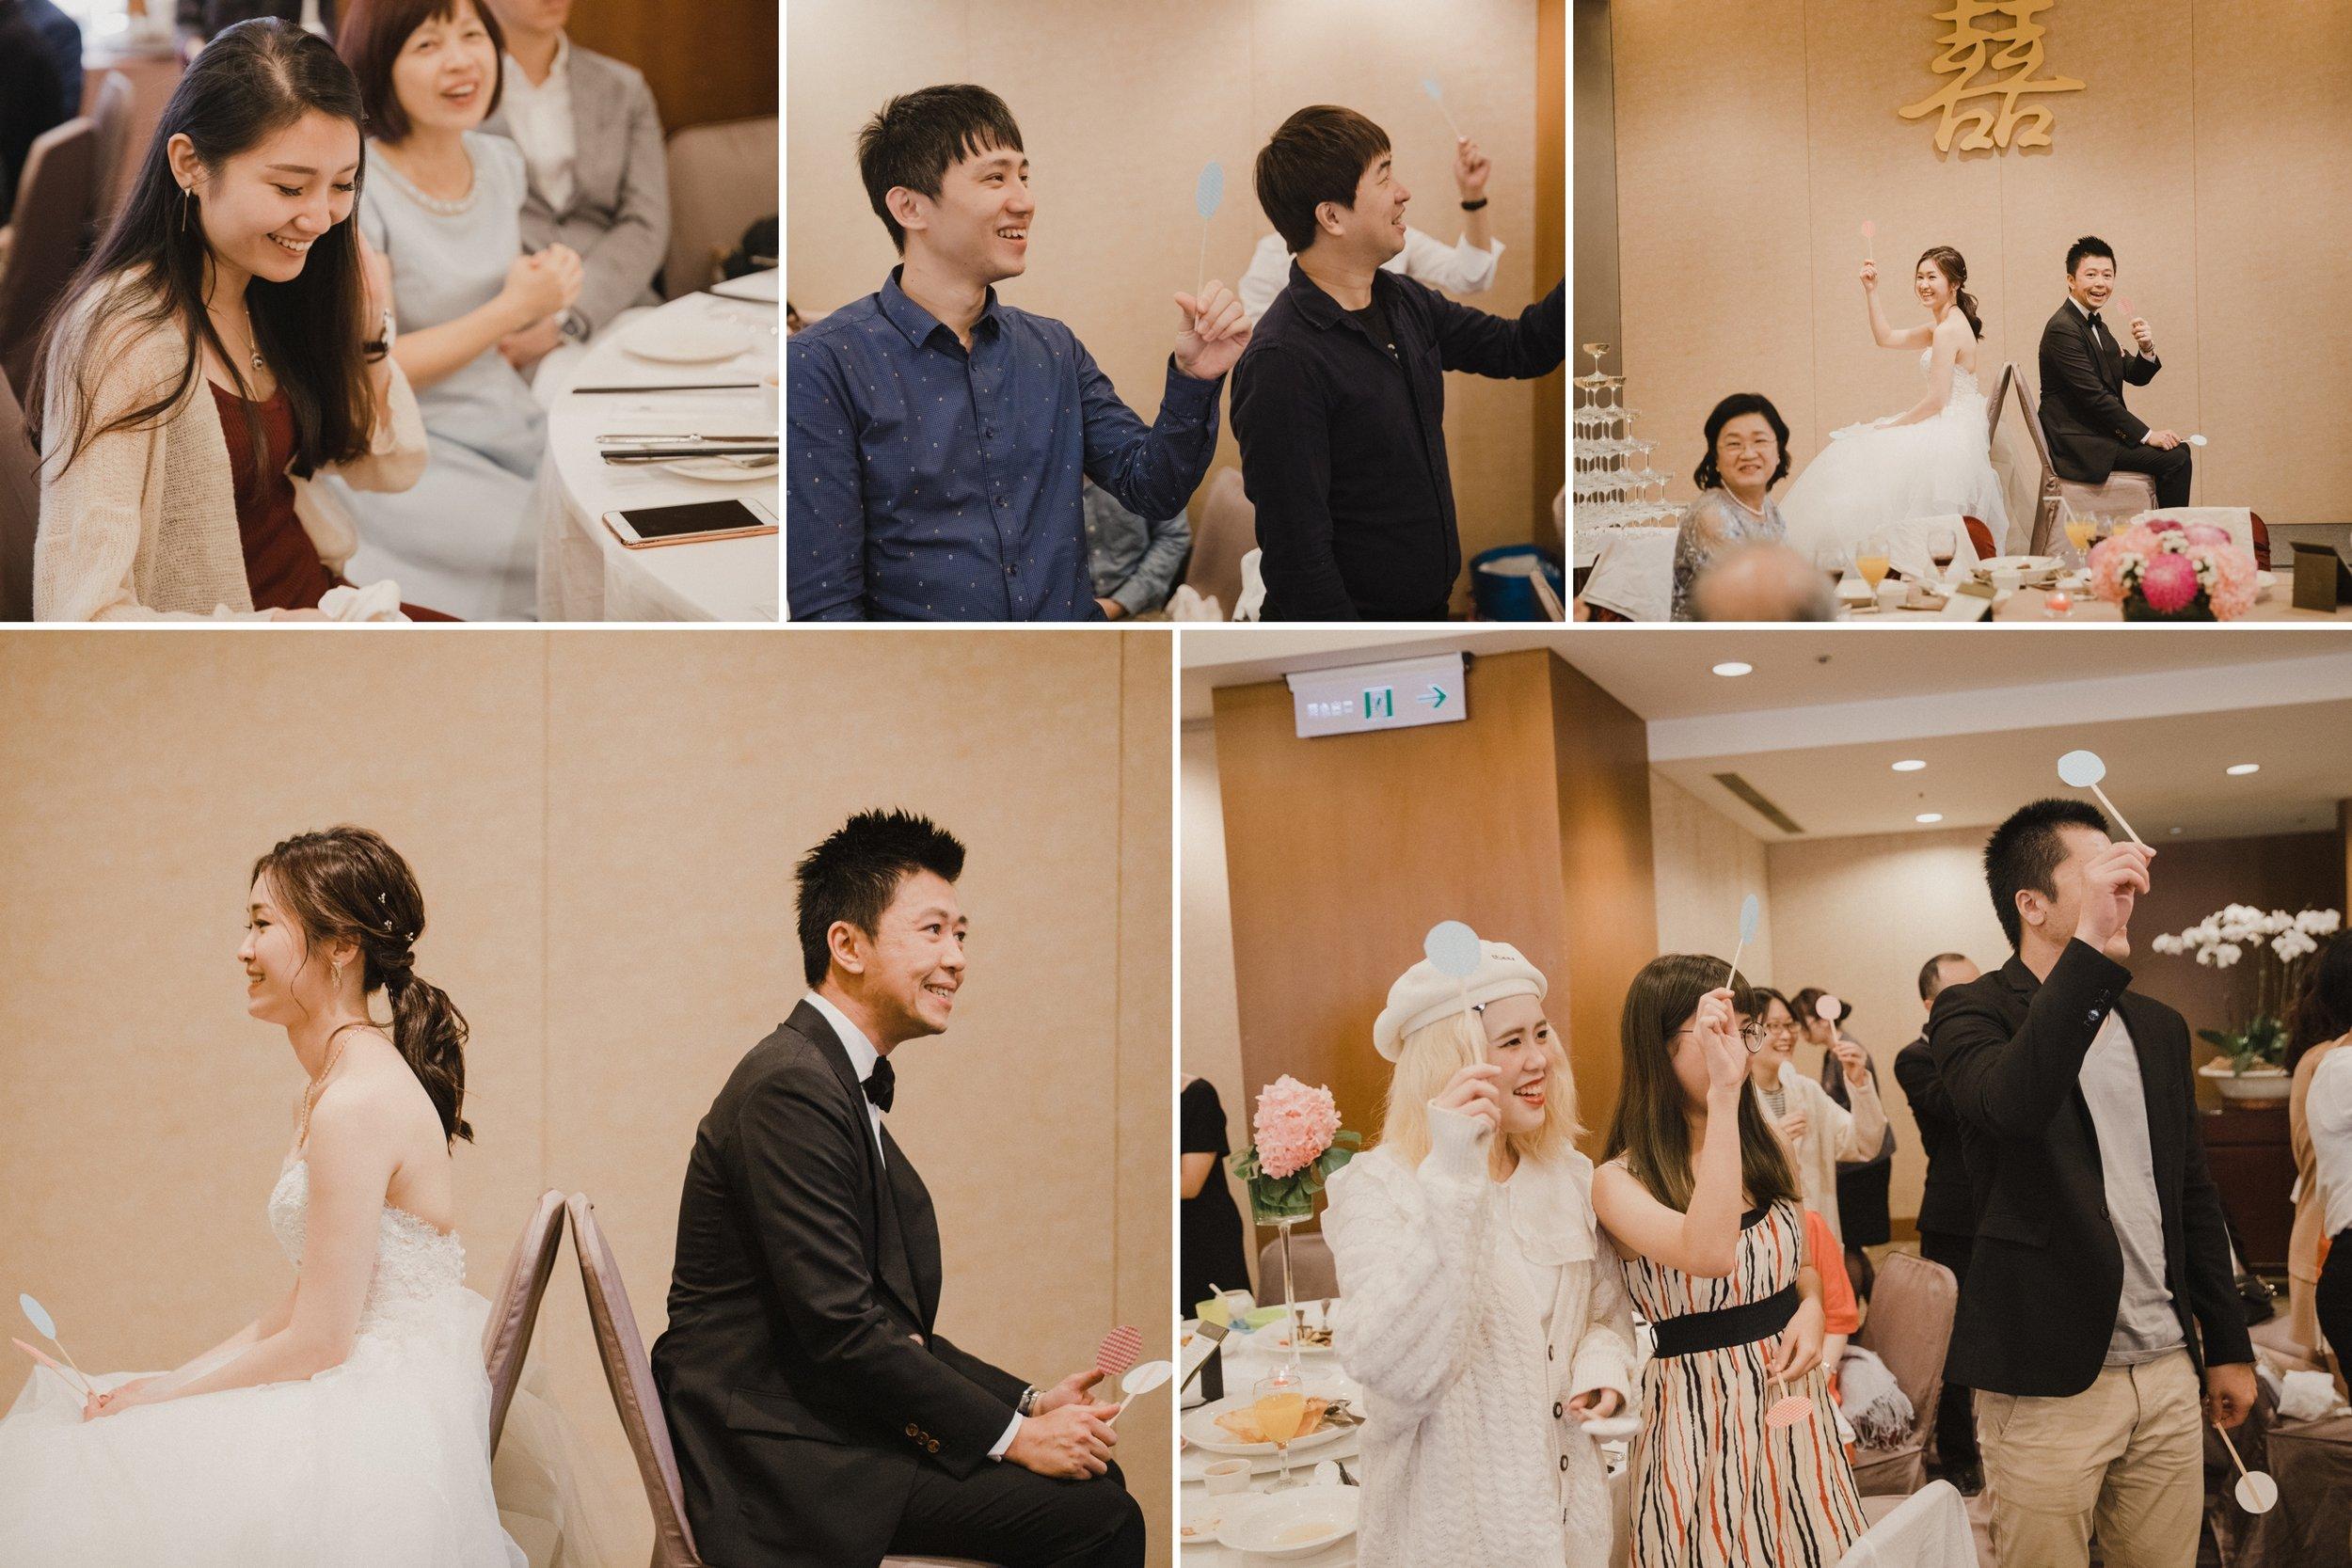 wedding-caridee-oscar-lunch-ambassador-hsinchu-結婚午宴-新竹國賓_128.jpg